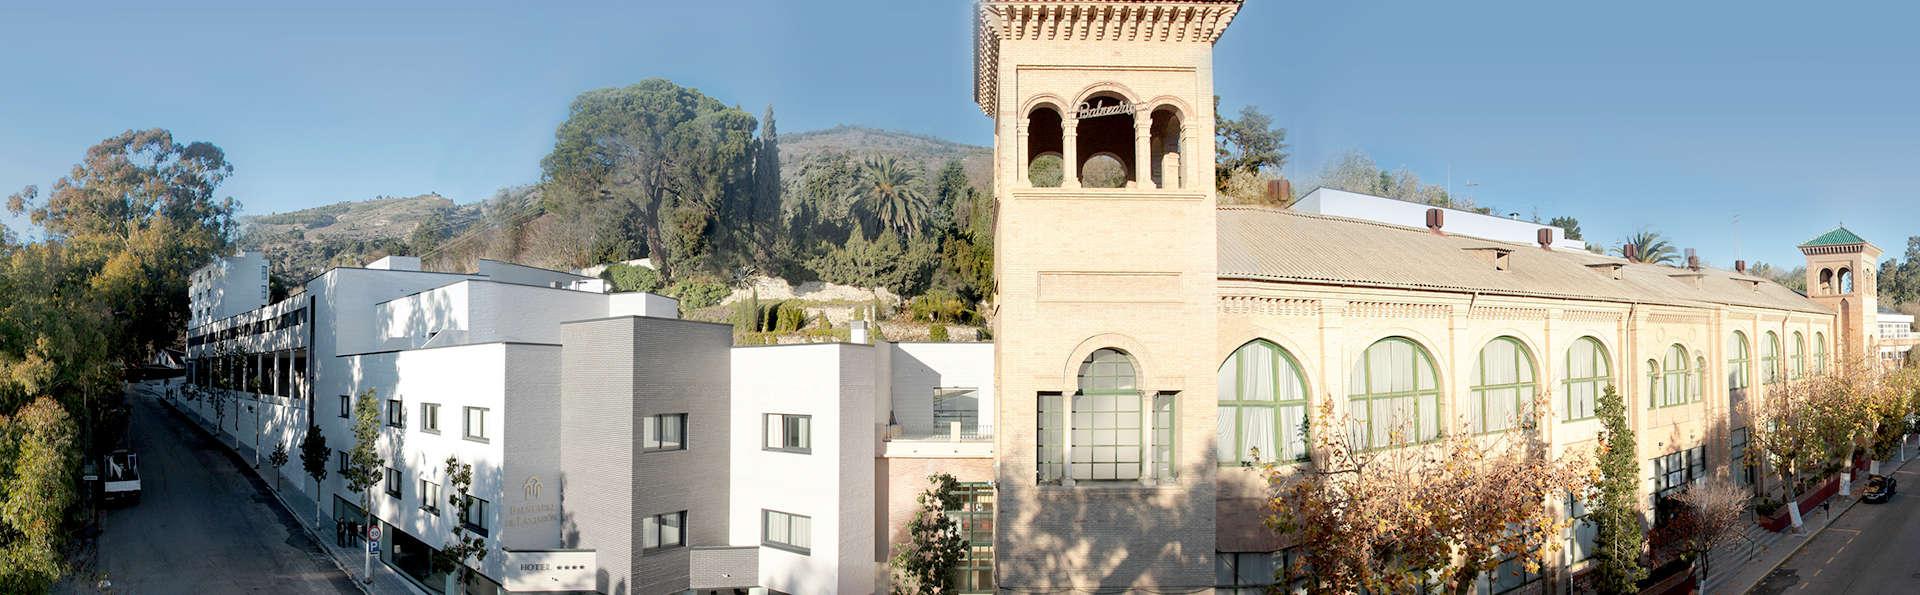 Hotel Balneario de Lanjarón - Edit_front.jpg